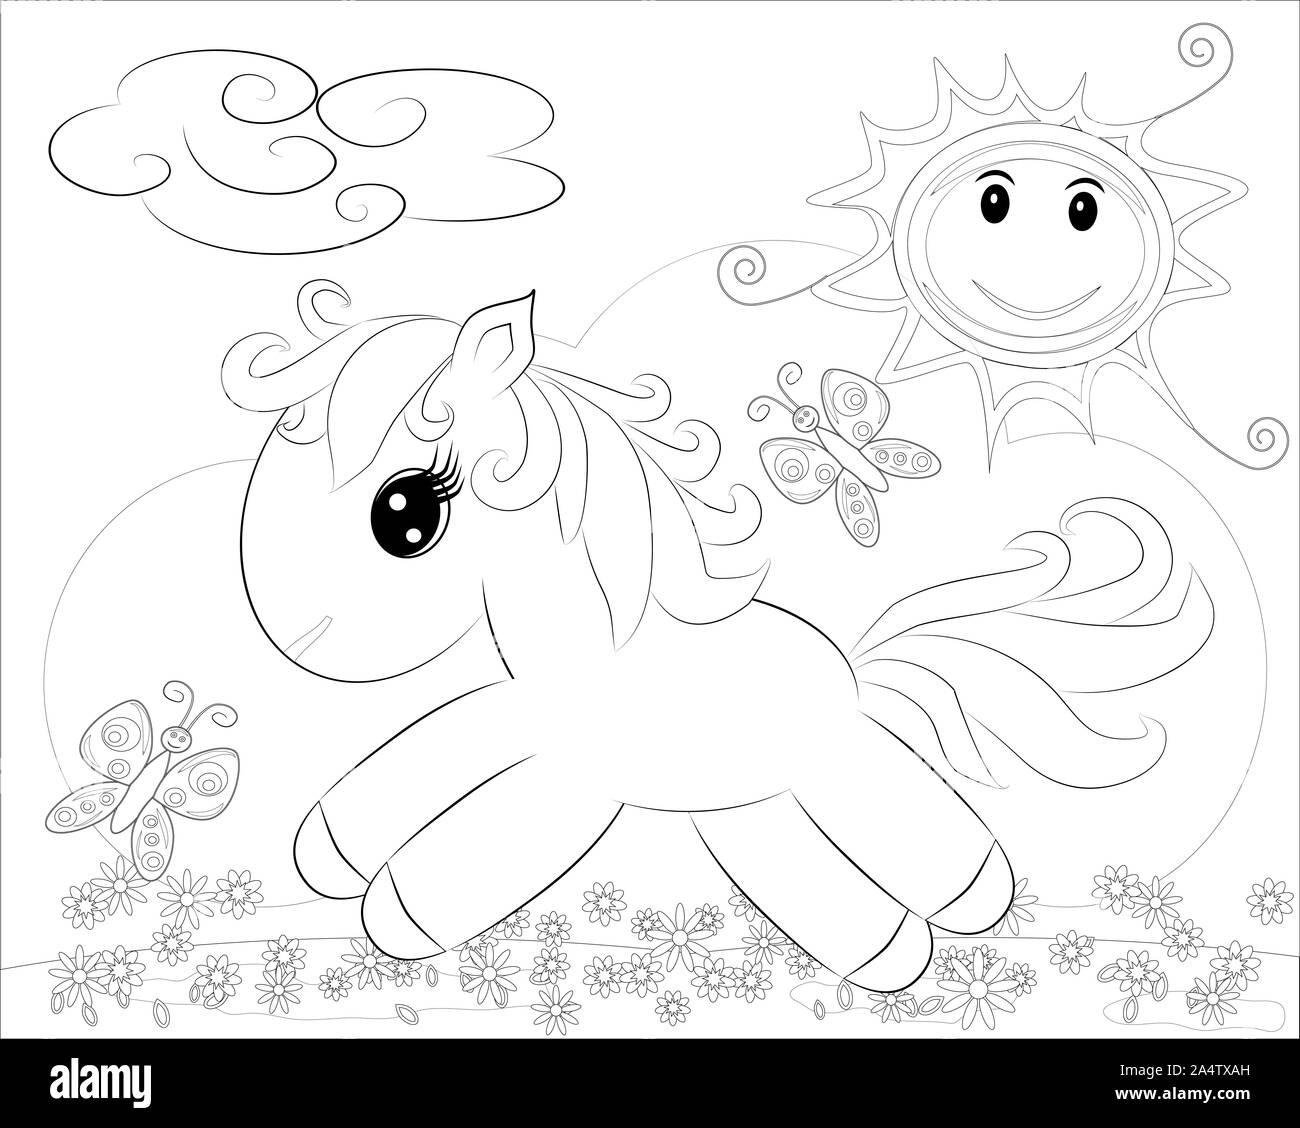 My Little Pony Cartoon Imágenes De Stock My Little Pony